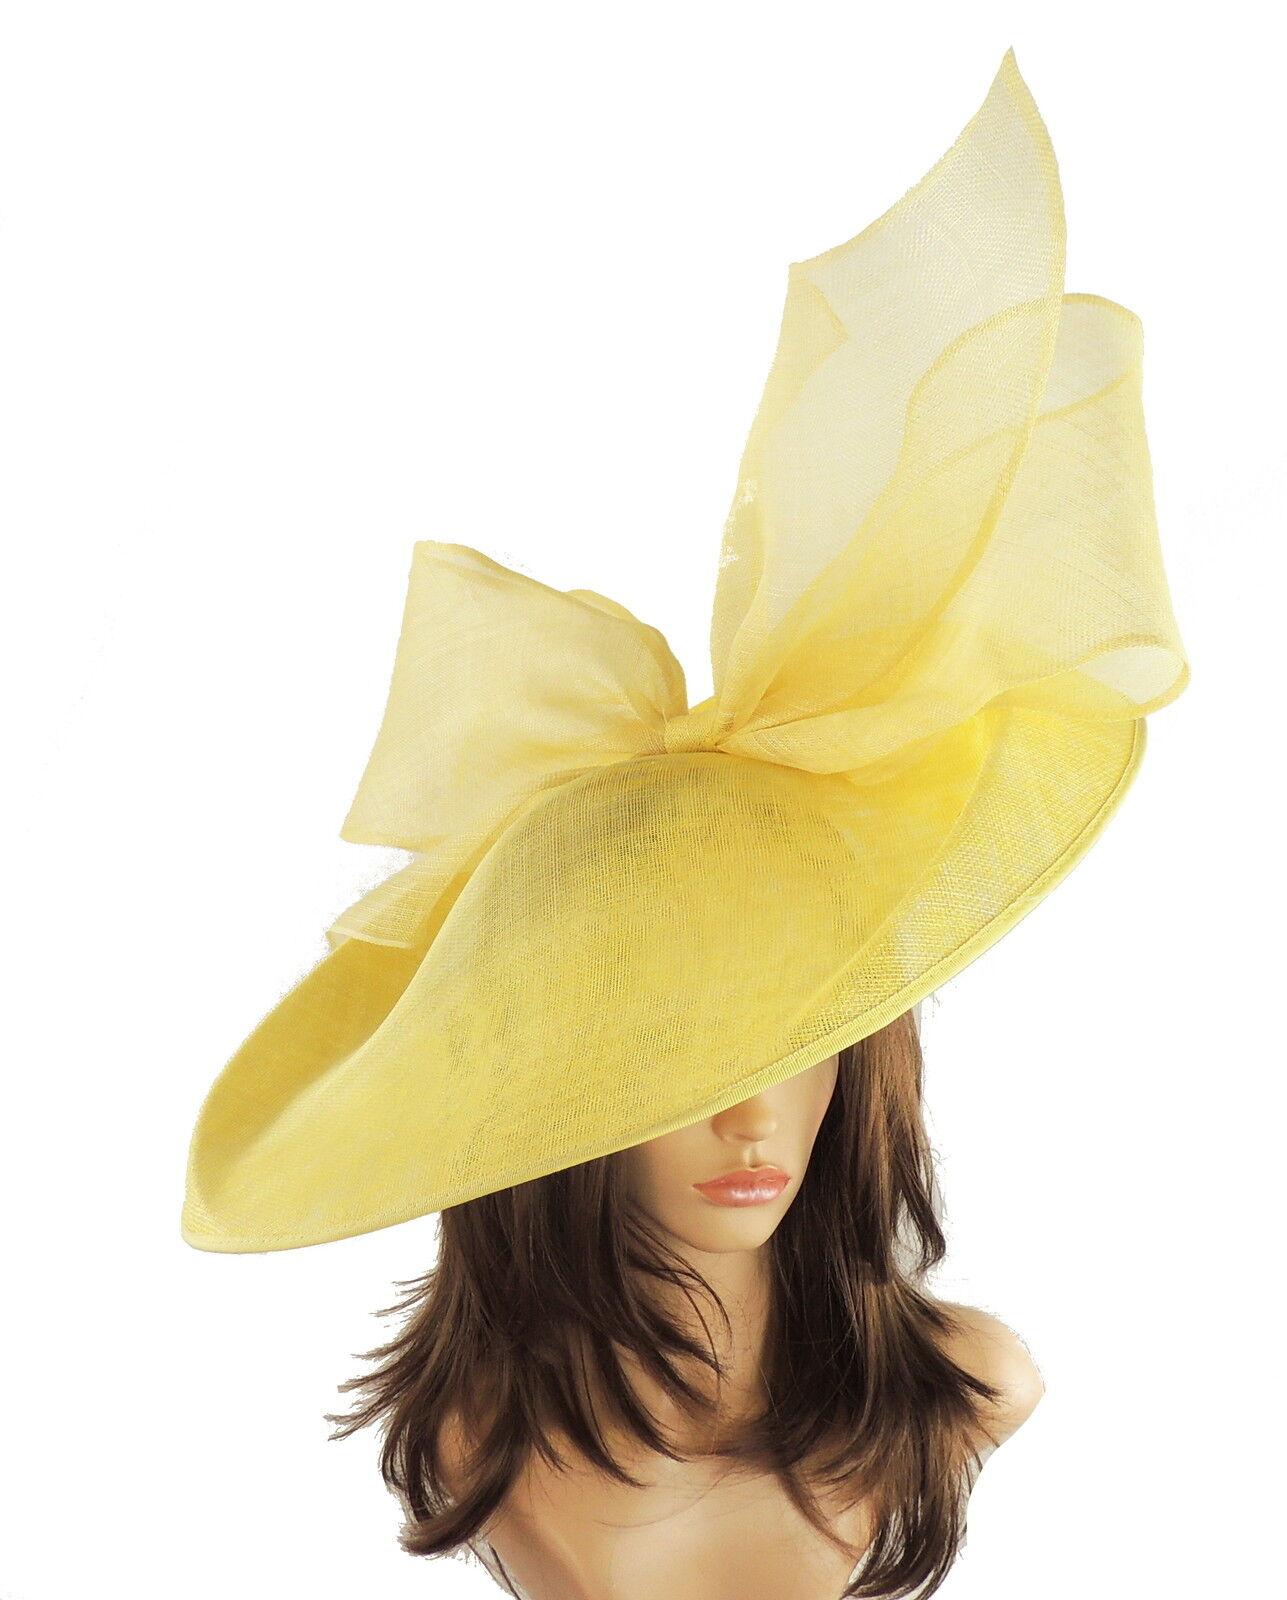 Lemon Yellow Large Ascot Hat for Weddings, Ascot, Derby B7